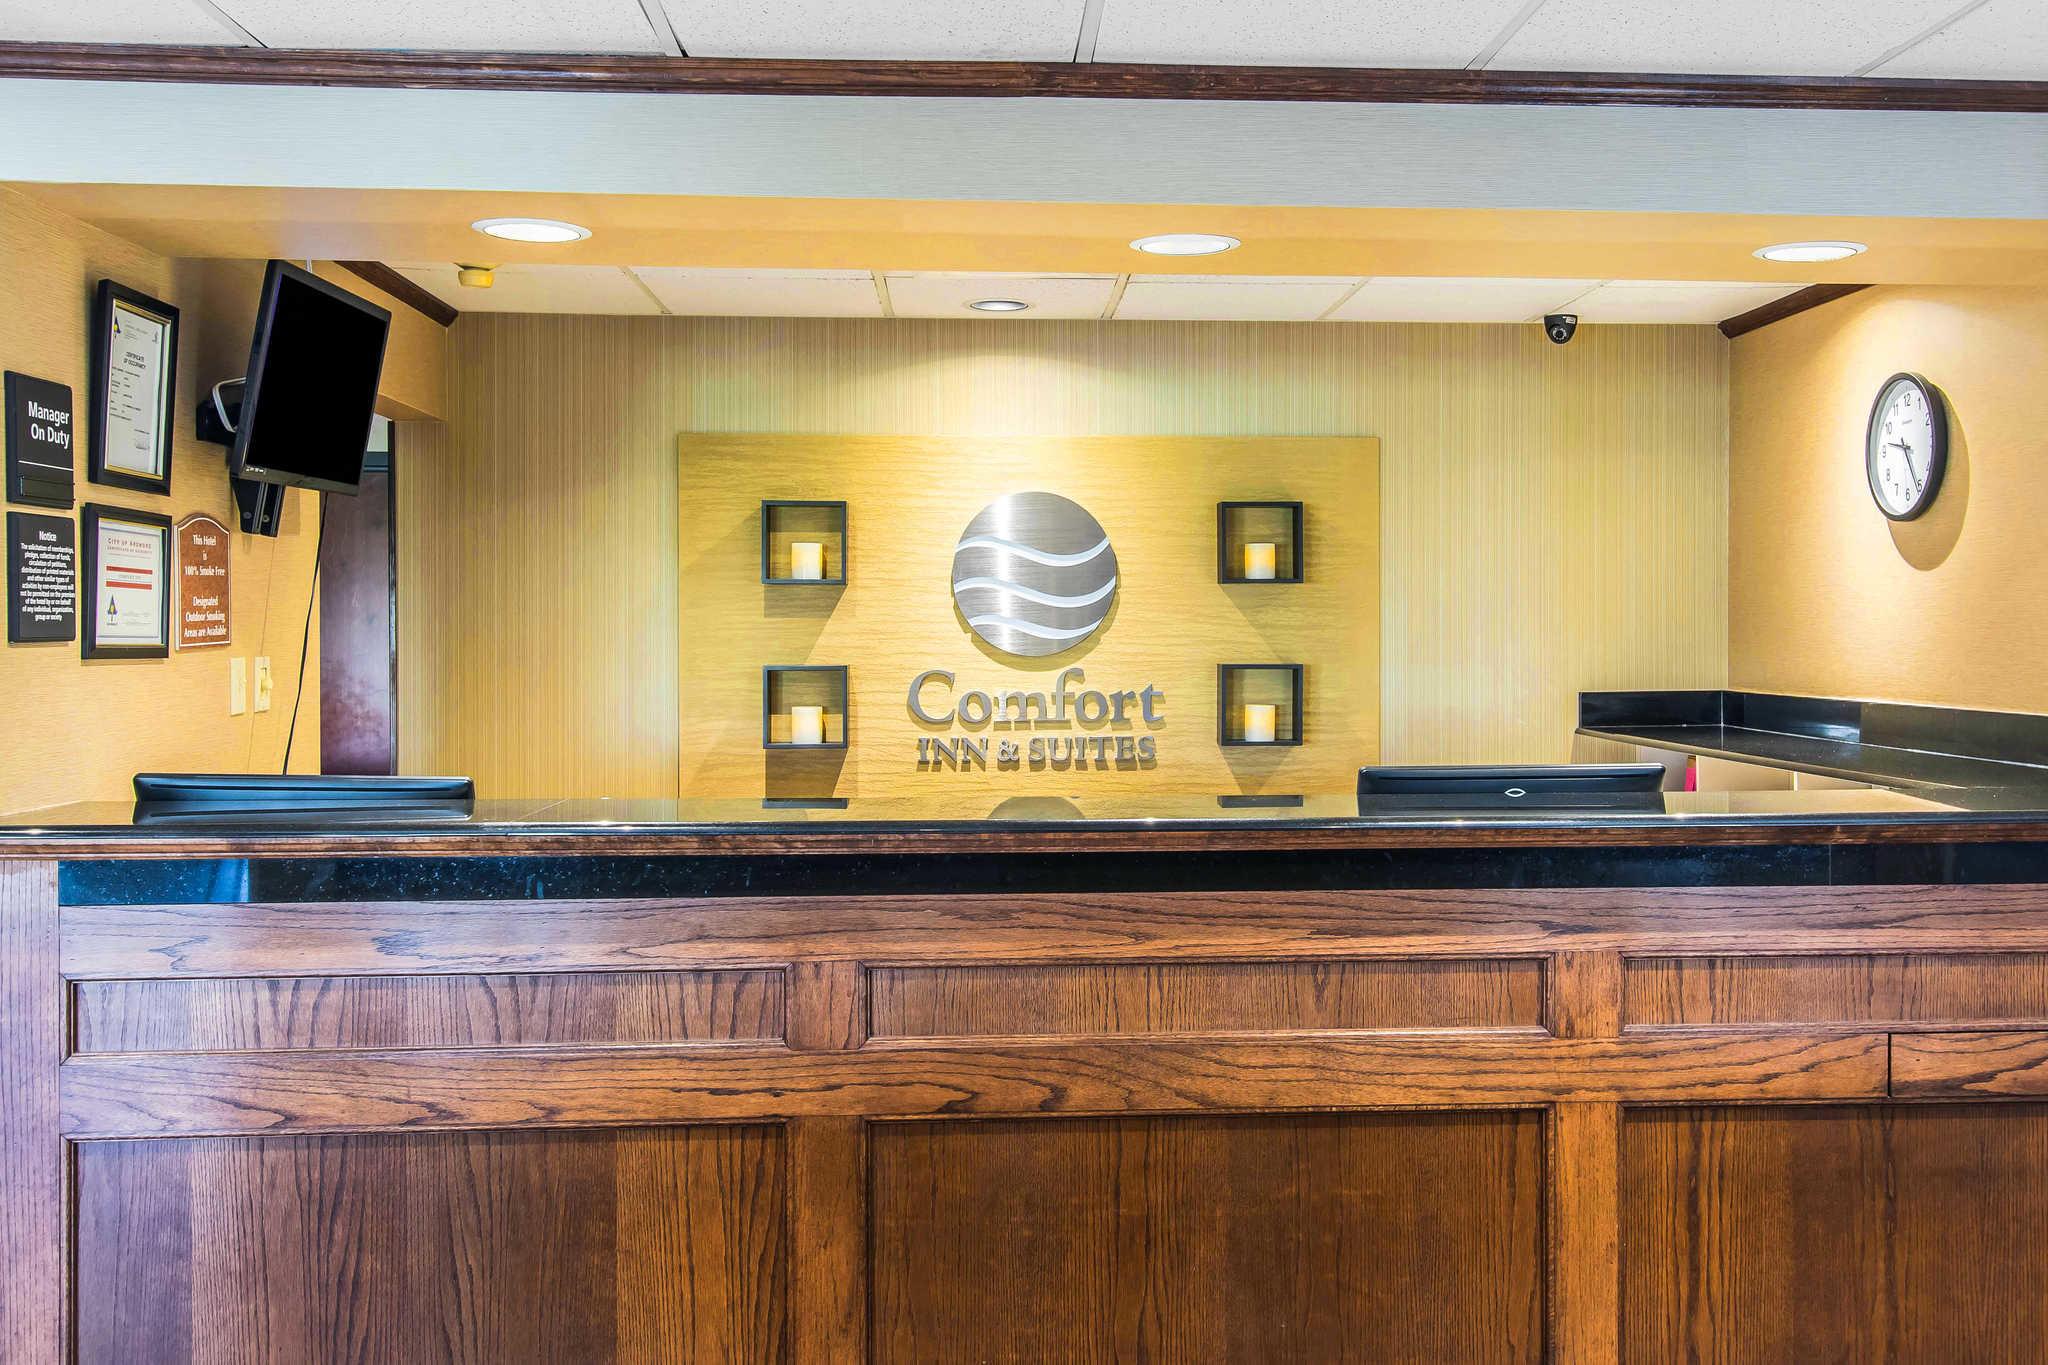 Comfort Inn & Suites Ardmore image 2